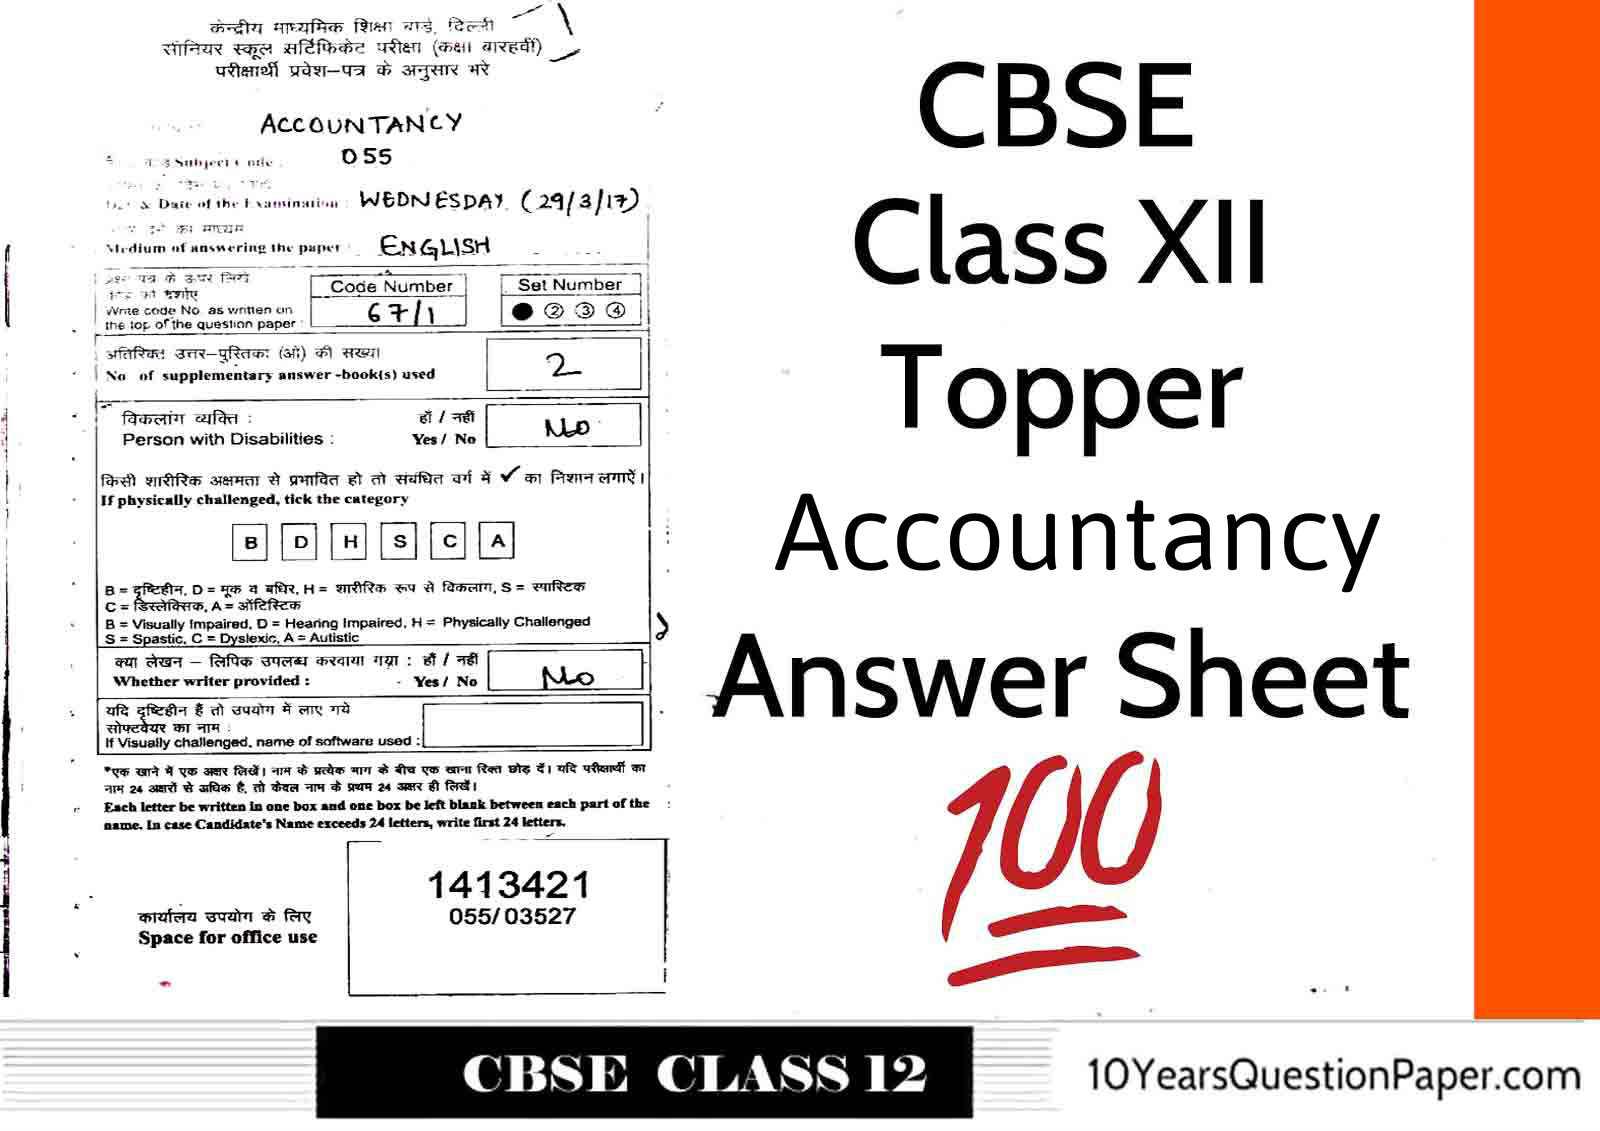 cbse class 12th Accountancy Topper answer